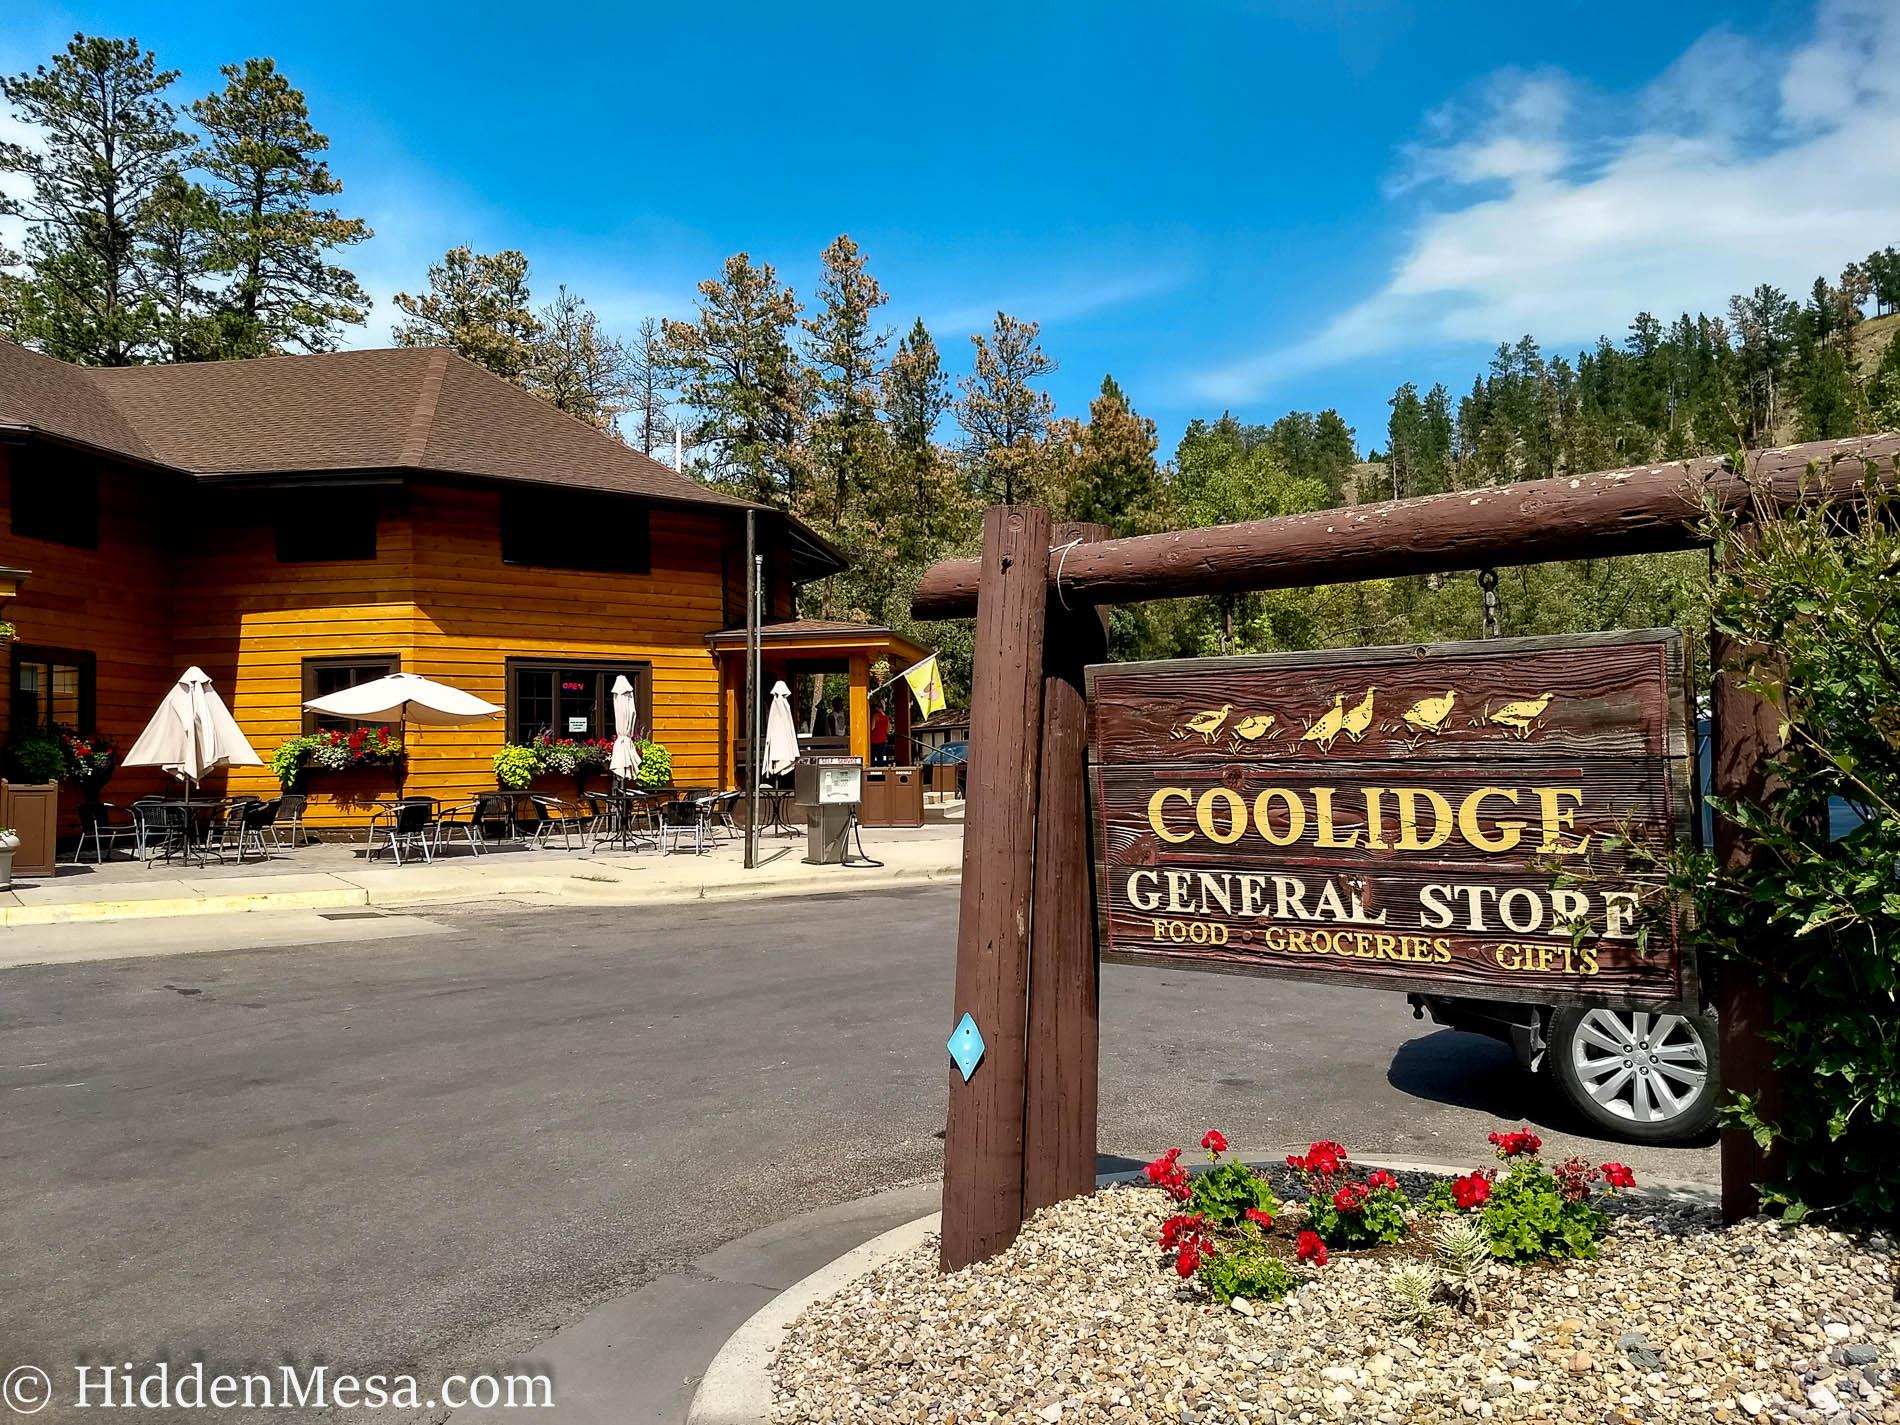 Coolidge General Store